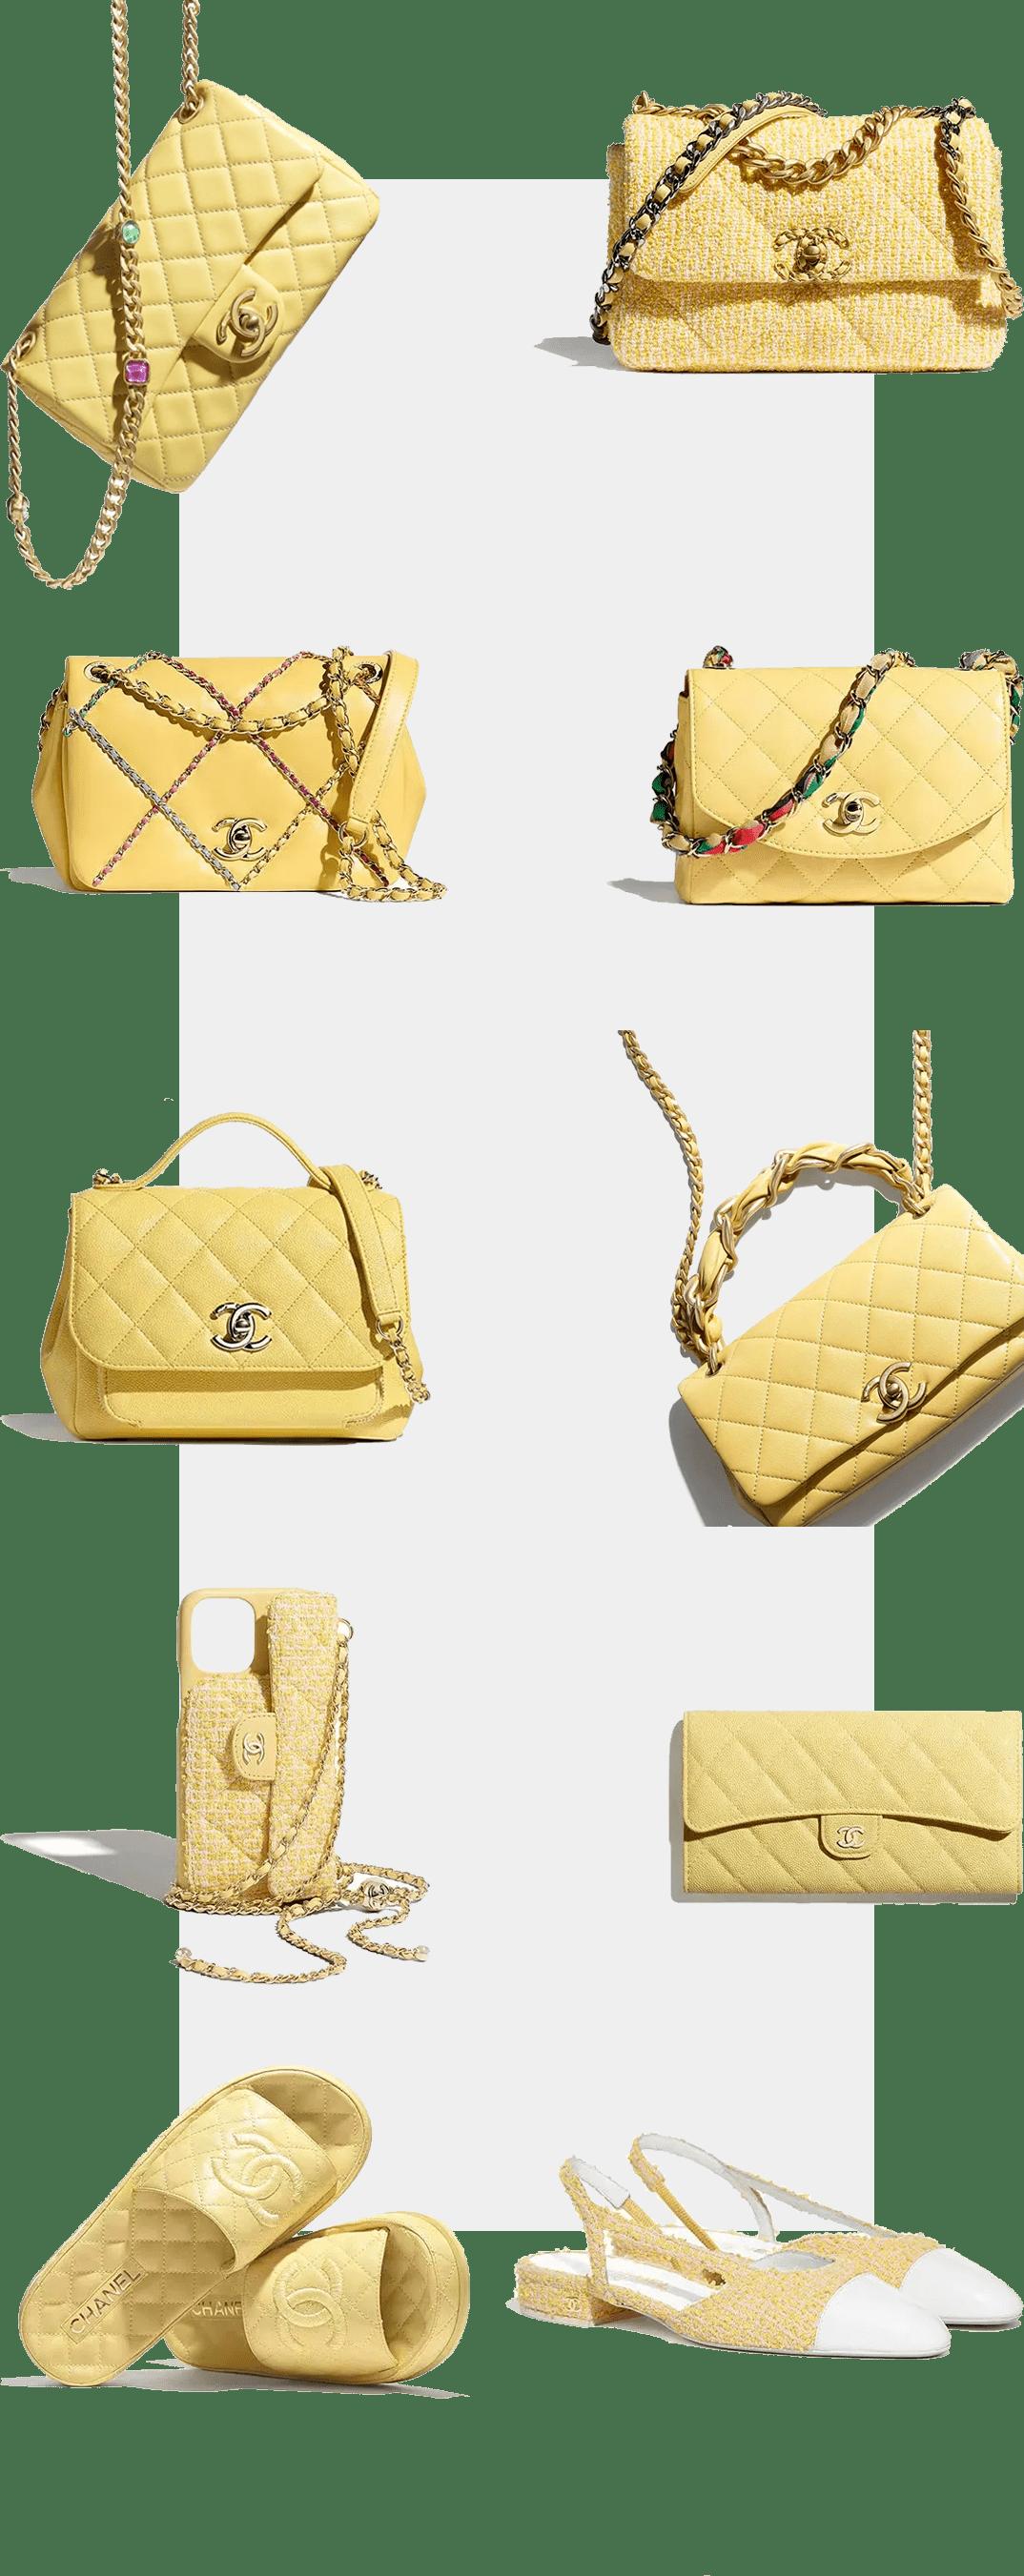 Chanel新年上新,灭霸级别的包包来了